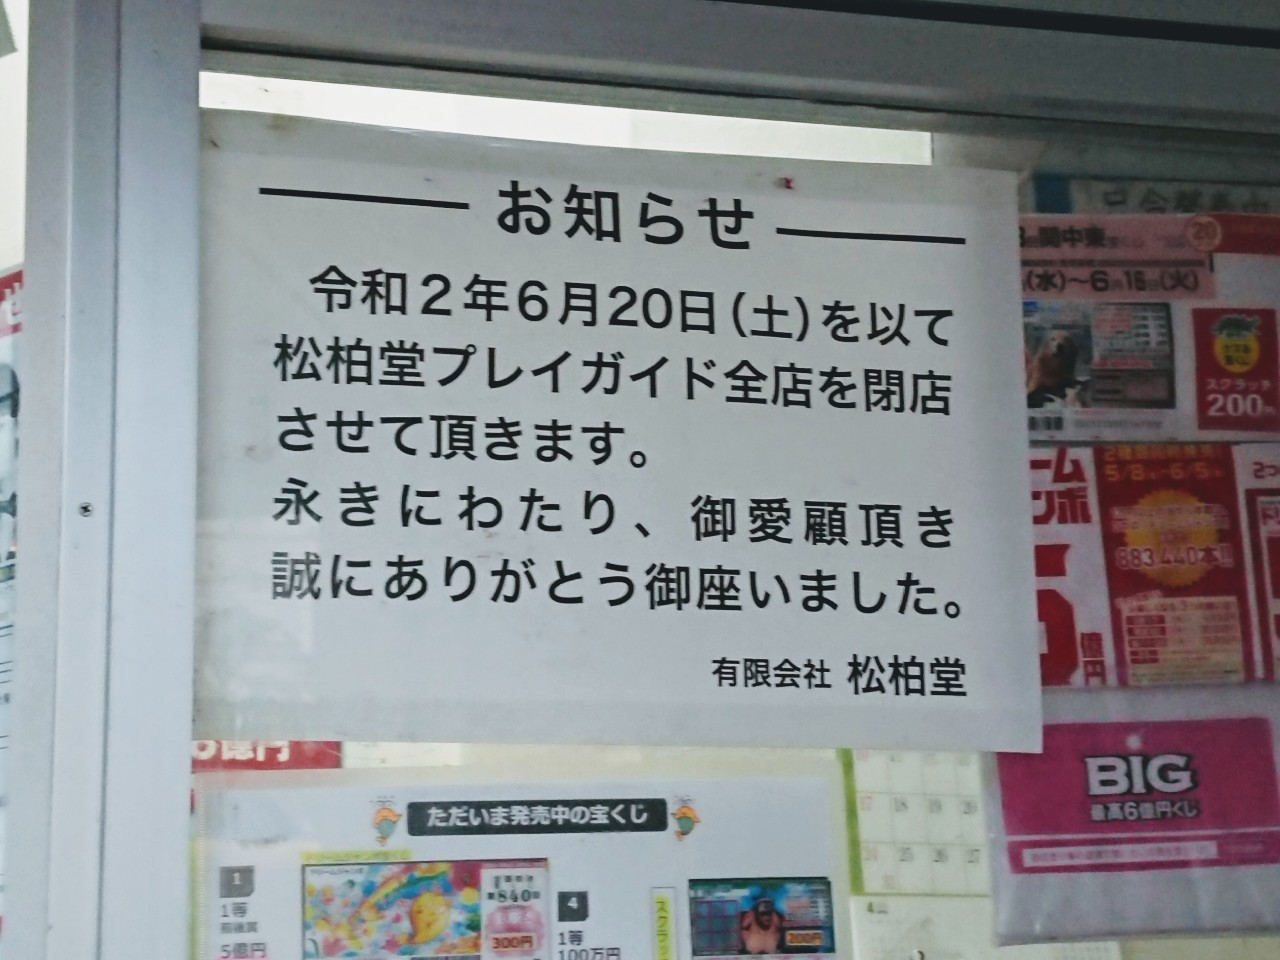 仕事 ガイド 函館 北海道 函館市の求人・転職情報 Indeed